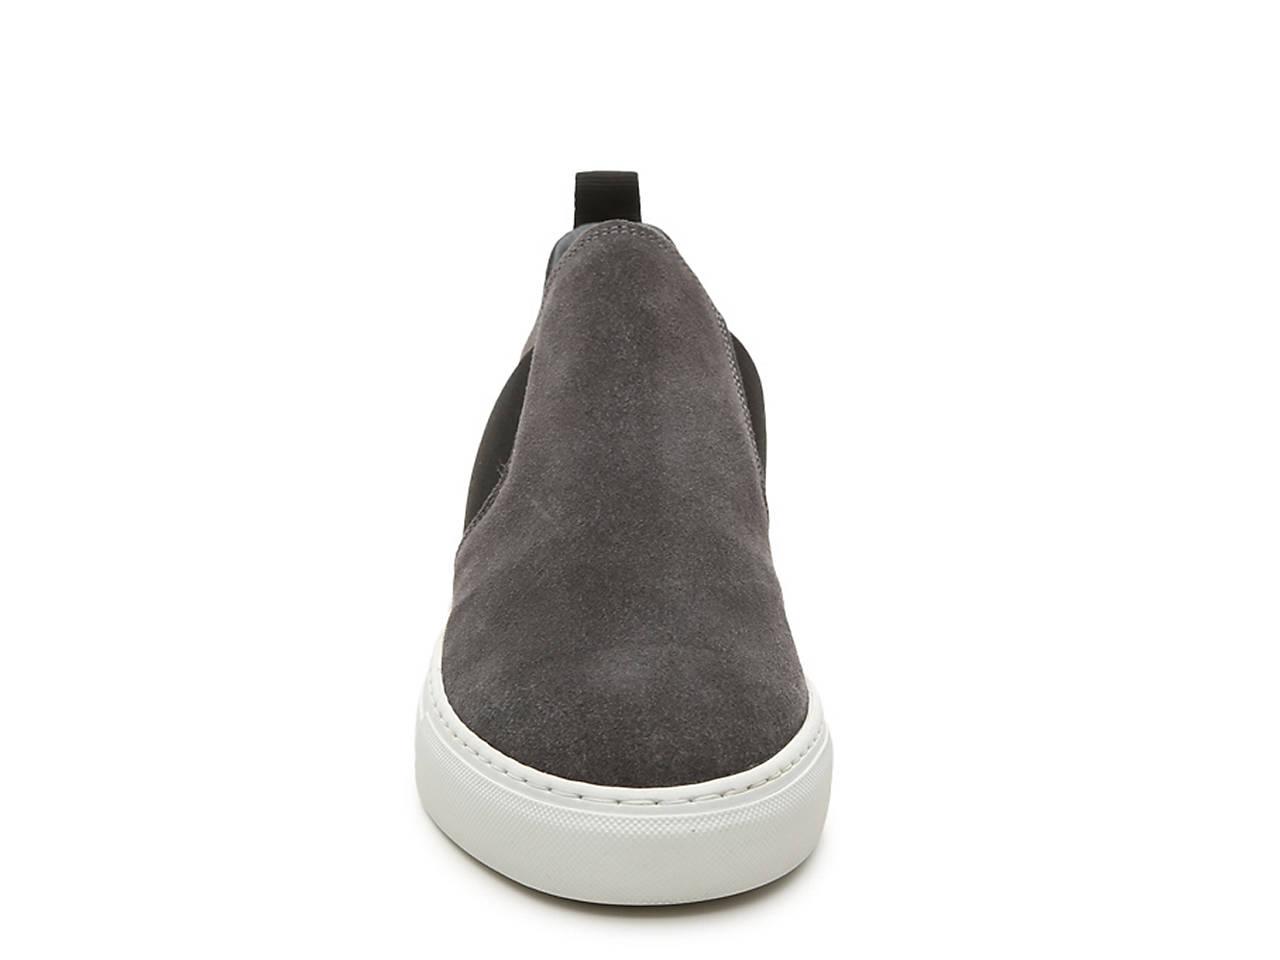 f3ff1685d04a4 Home · Men's Shoes · Sneakers; Landon Slip-On Sneaker. previous